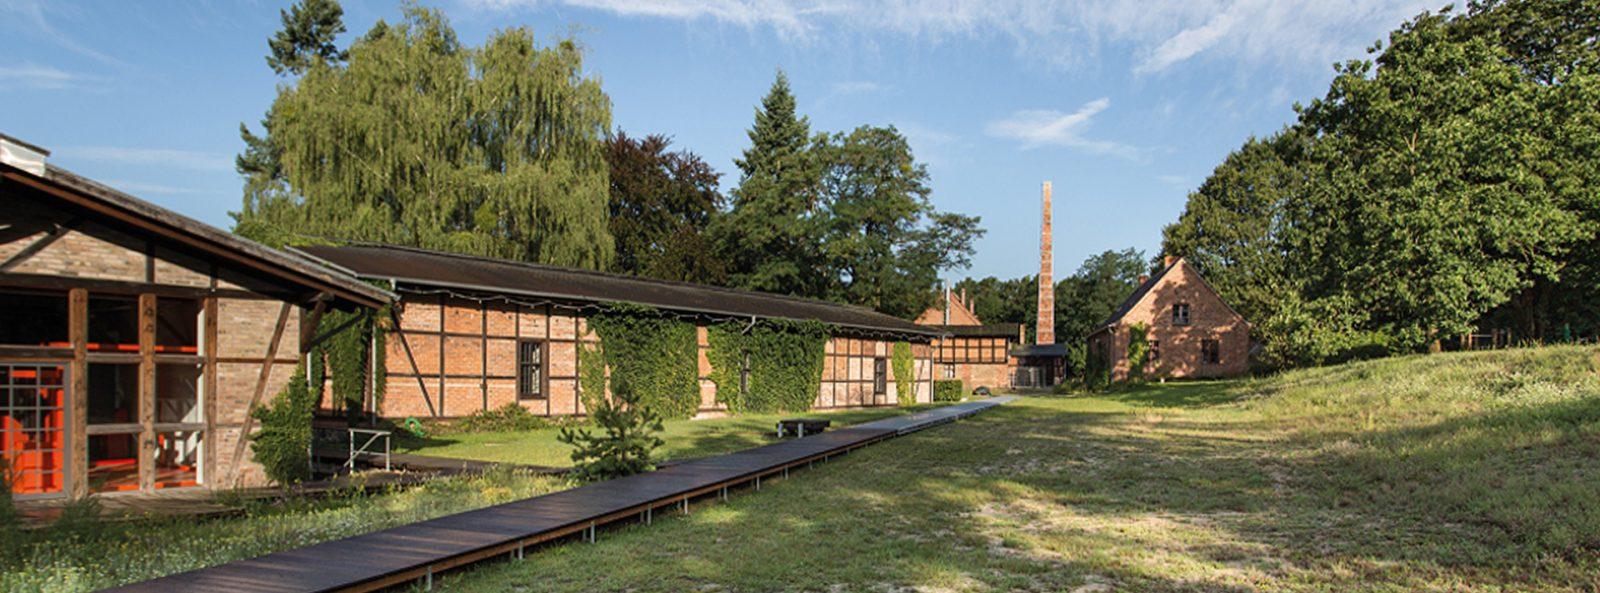 Museen | Museumsdorf Baruther Glashütte (TF)